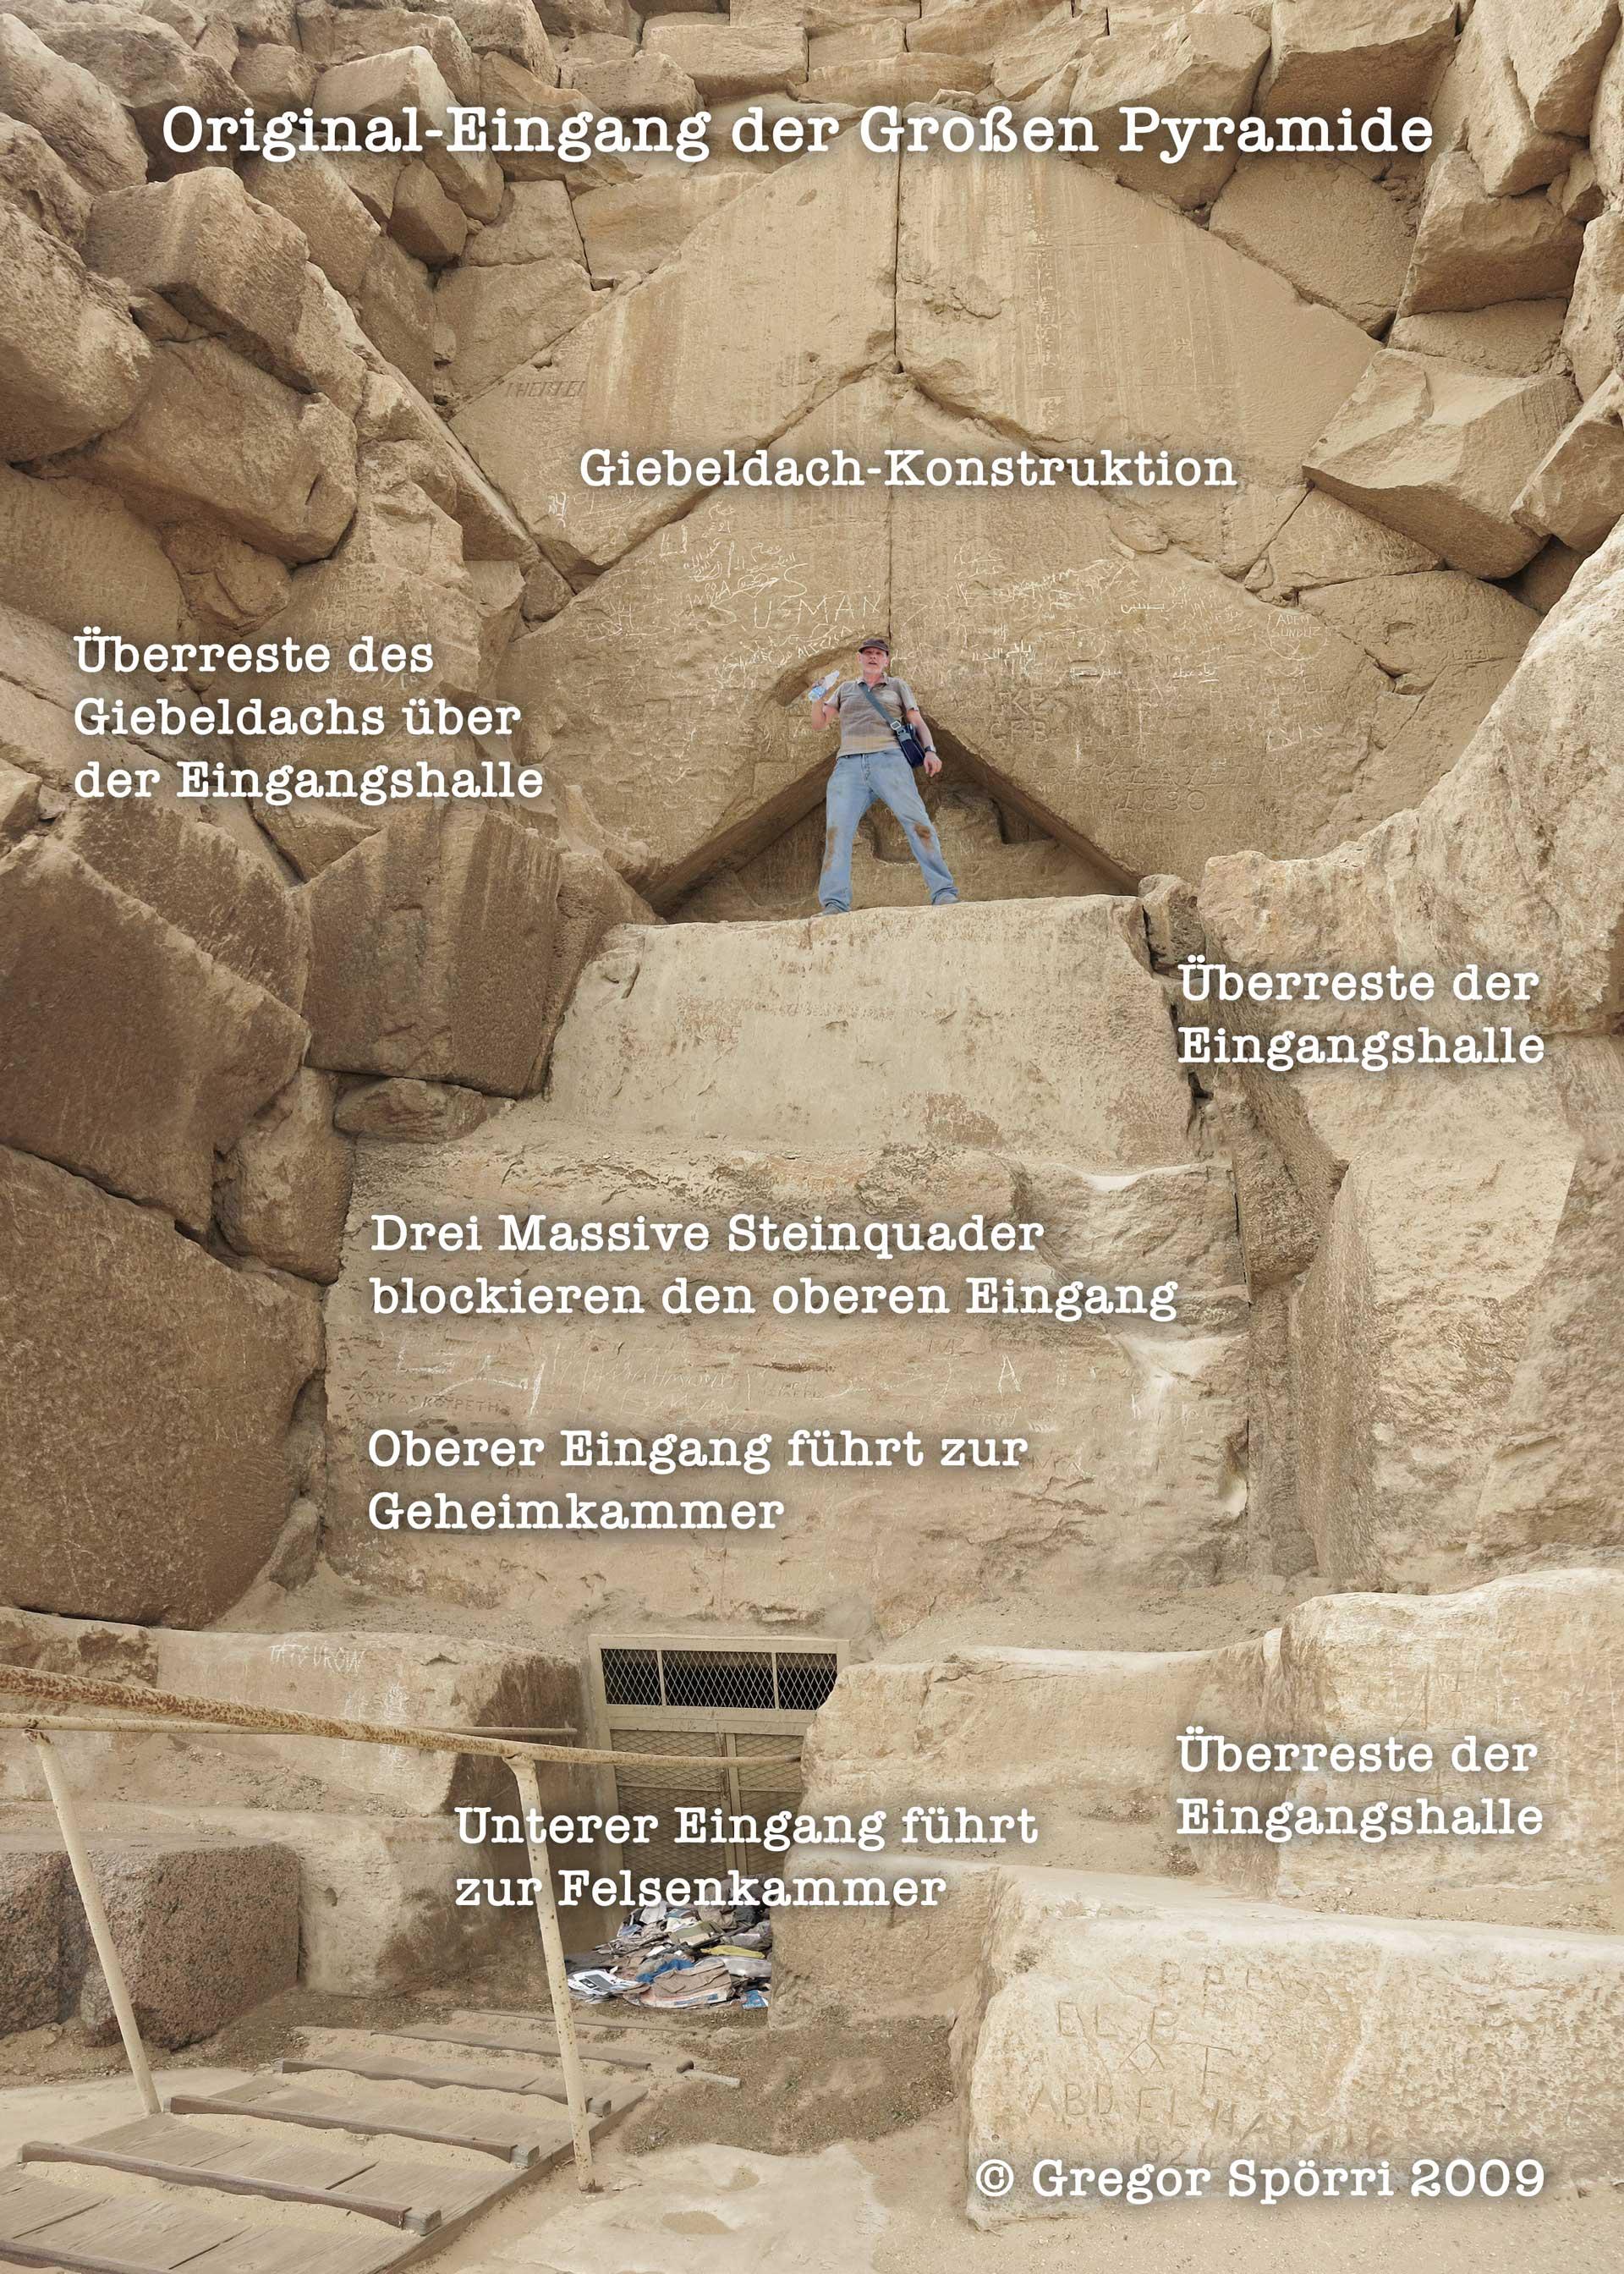 Original Eingang zur Cheops-Pyramide.